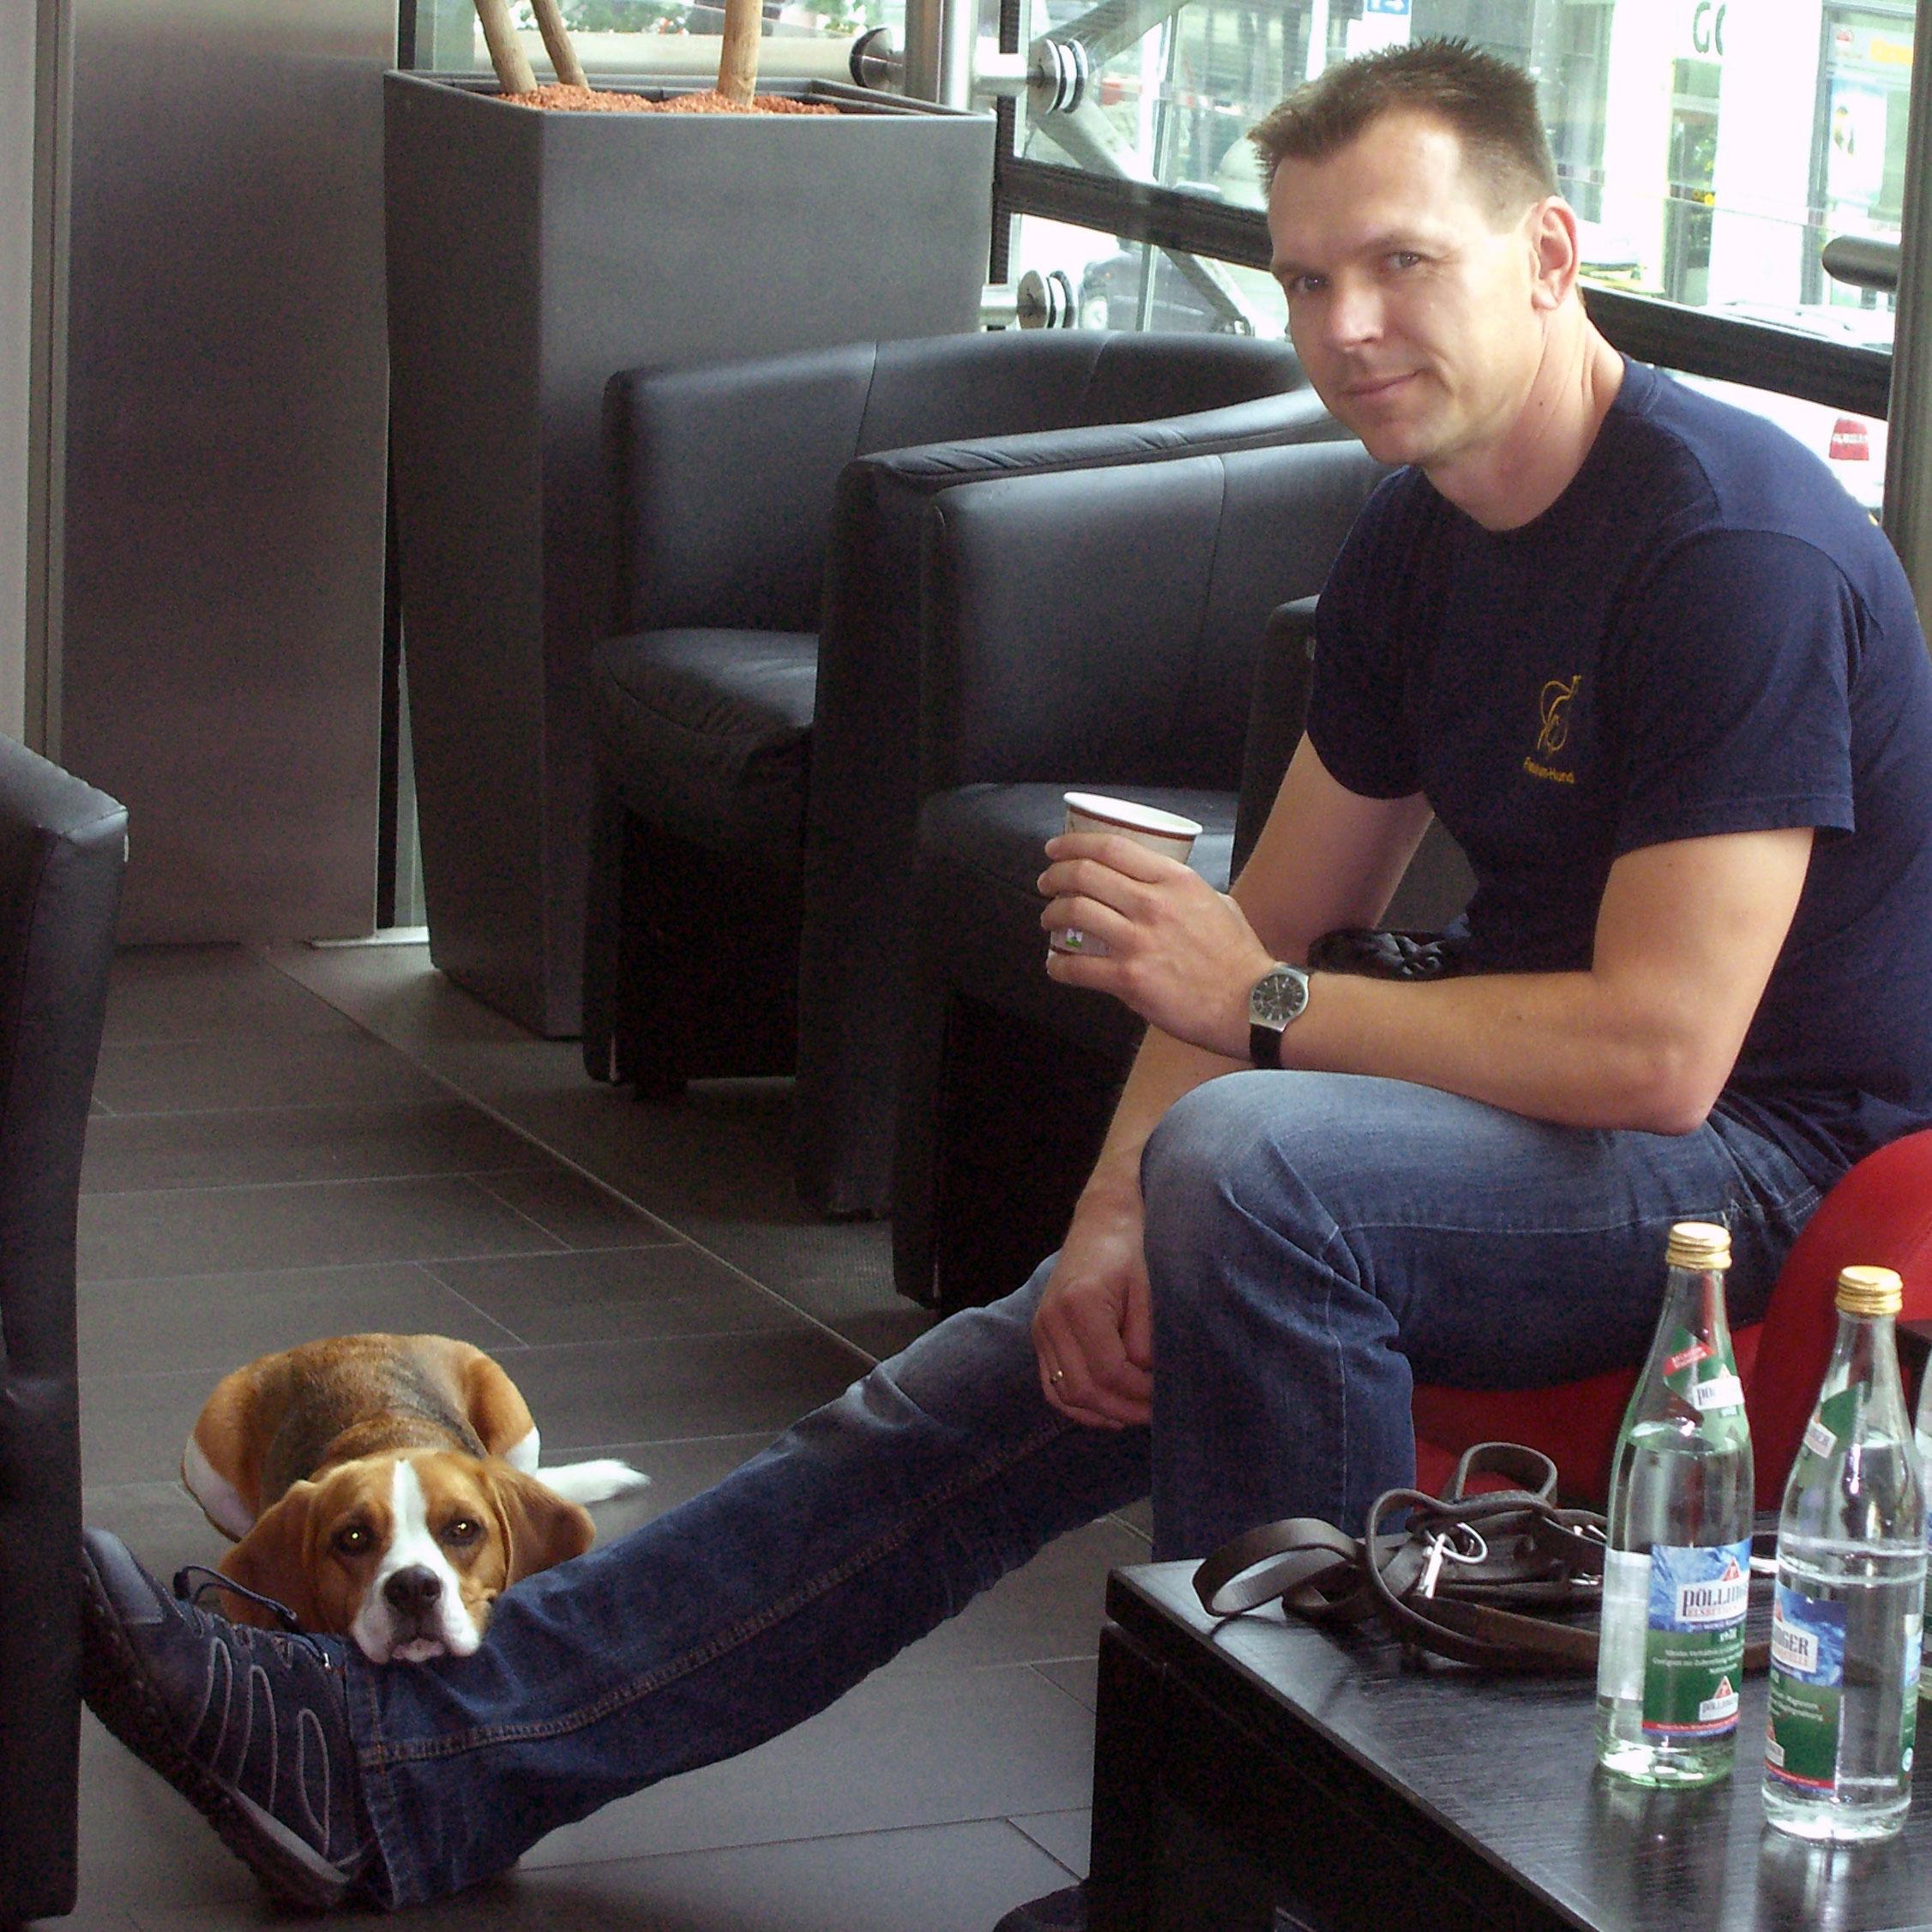 3 hundetrainer hundeschule freude am hund calli richter | Freude am Hund München